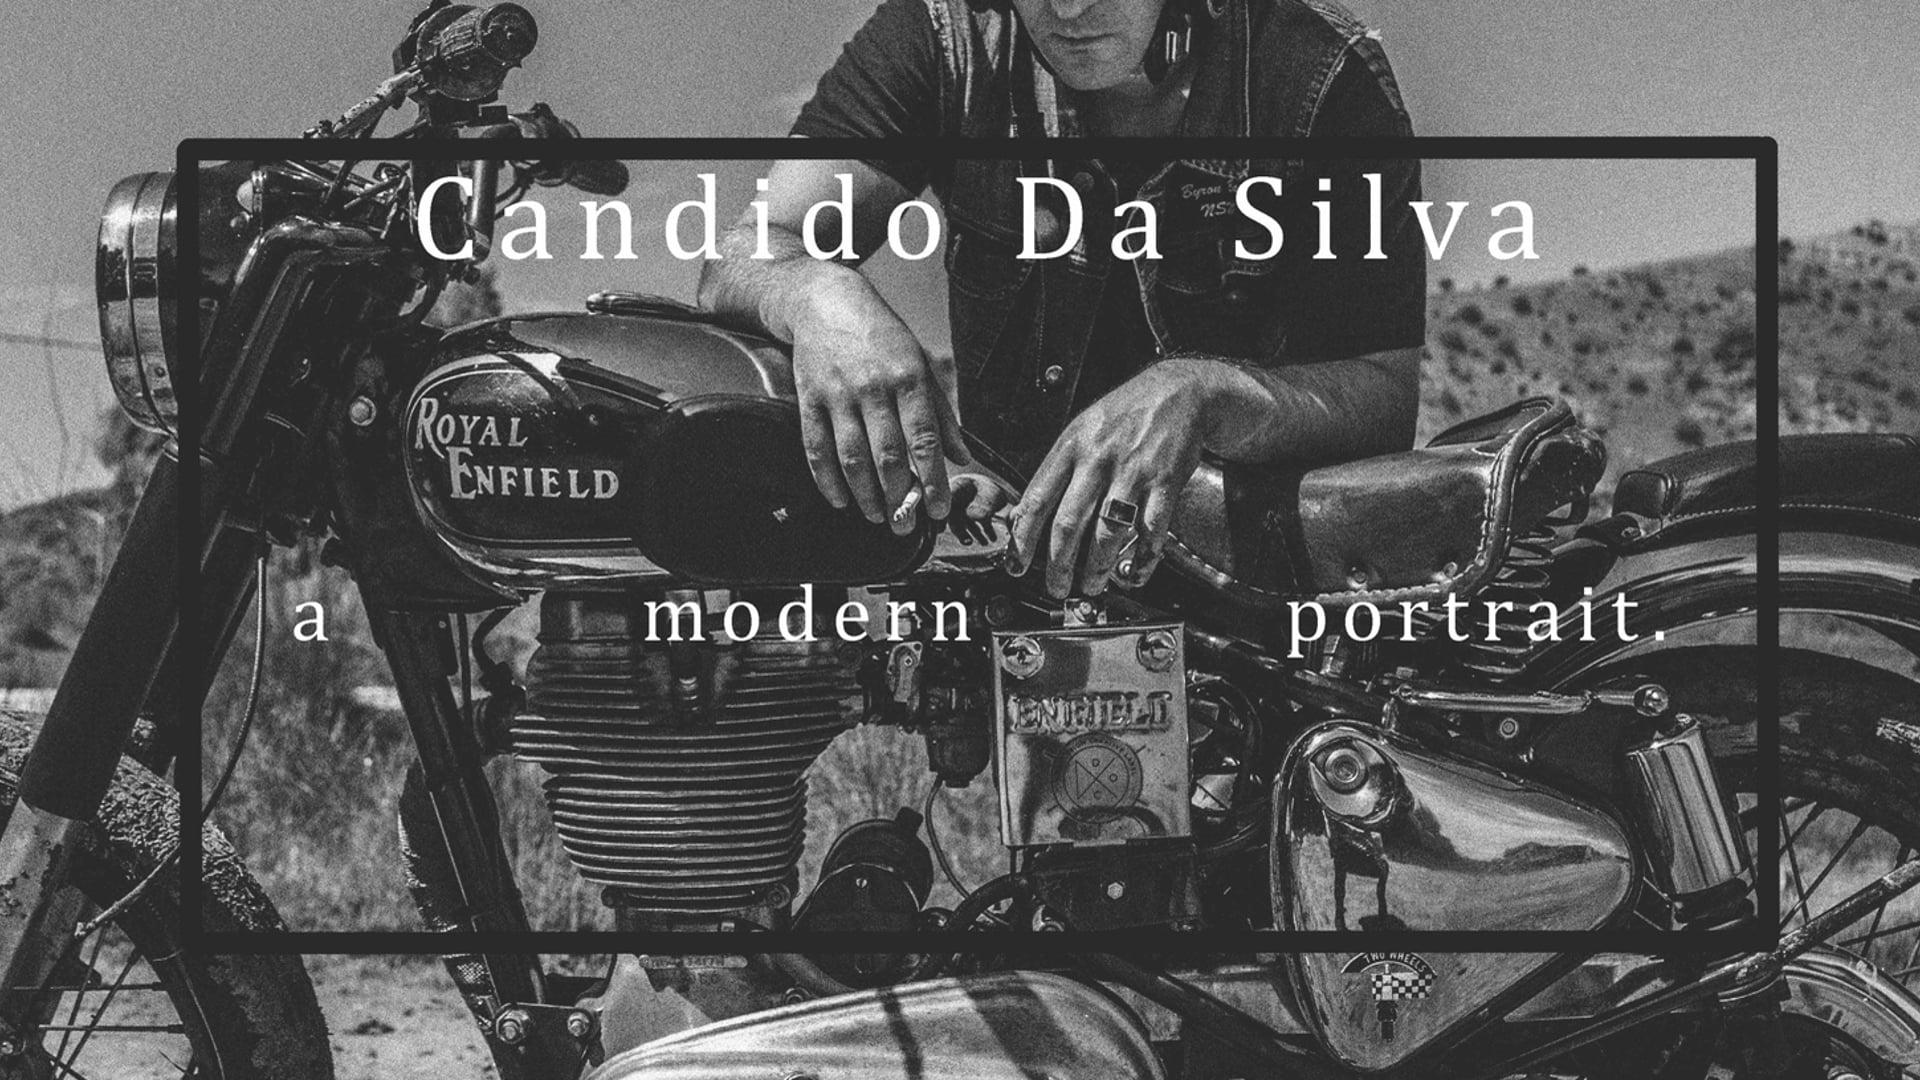 CANDIDO DA SILVA // a modern Portrait